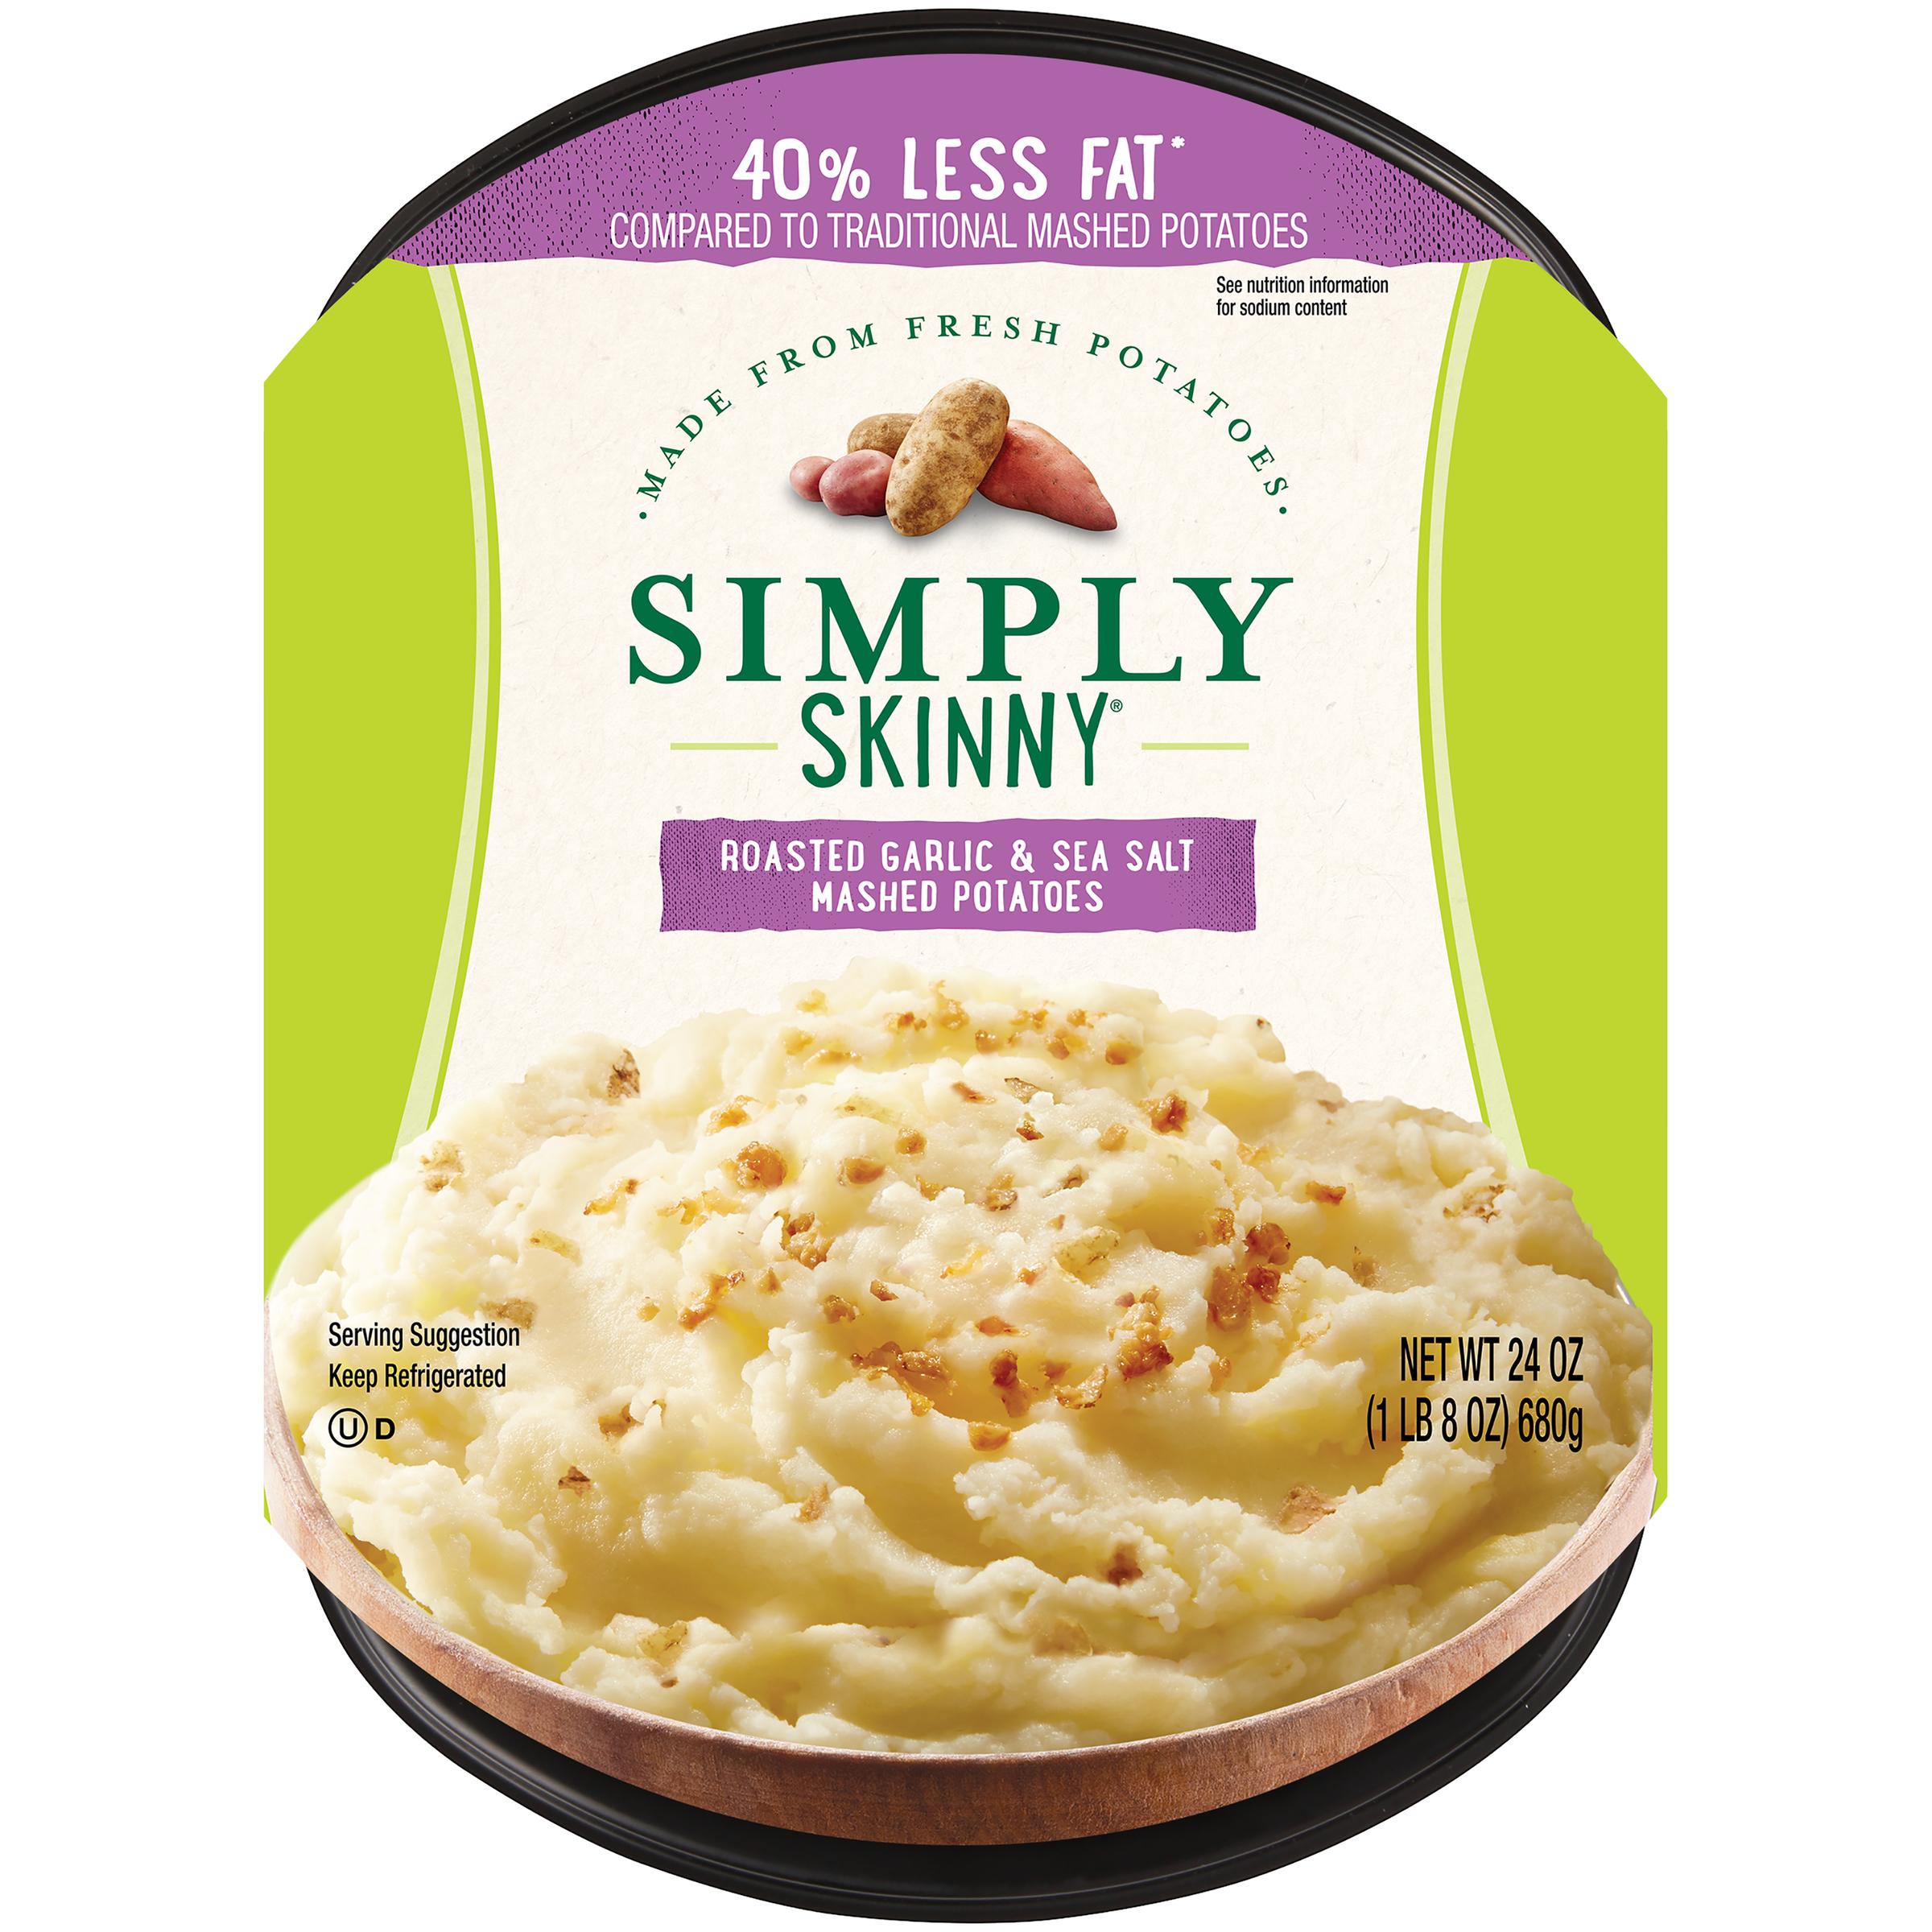 photo of Simply Skinny Roasted Garlic & Sea Salt Mashed Potatoes product